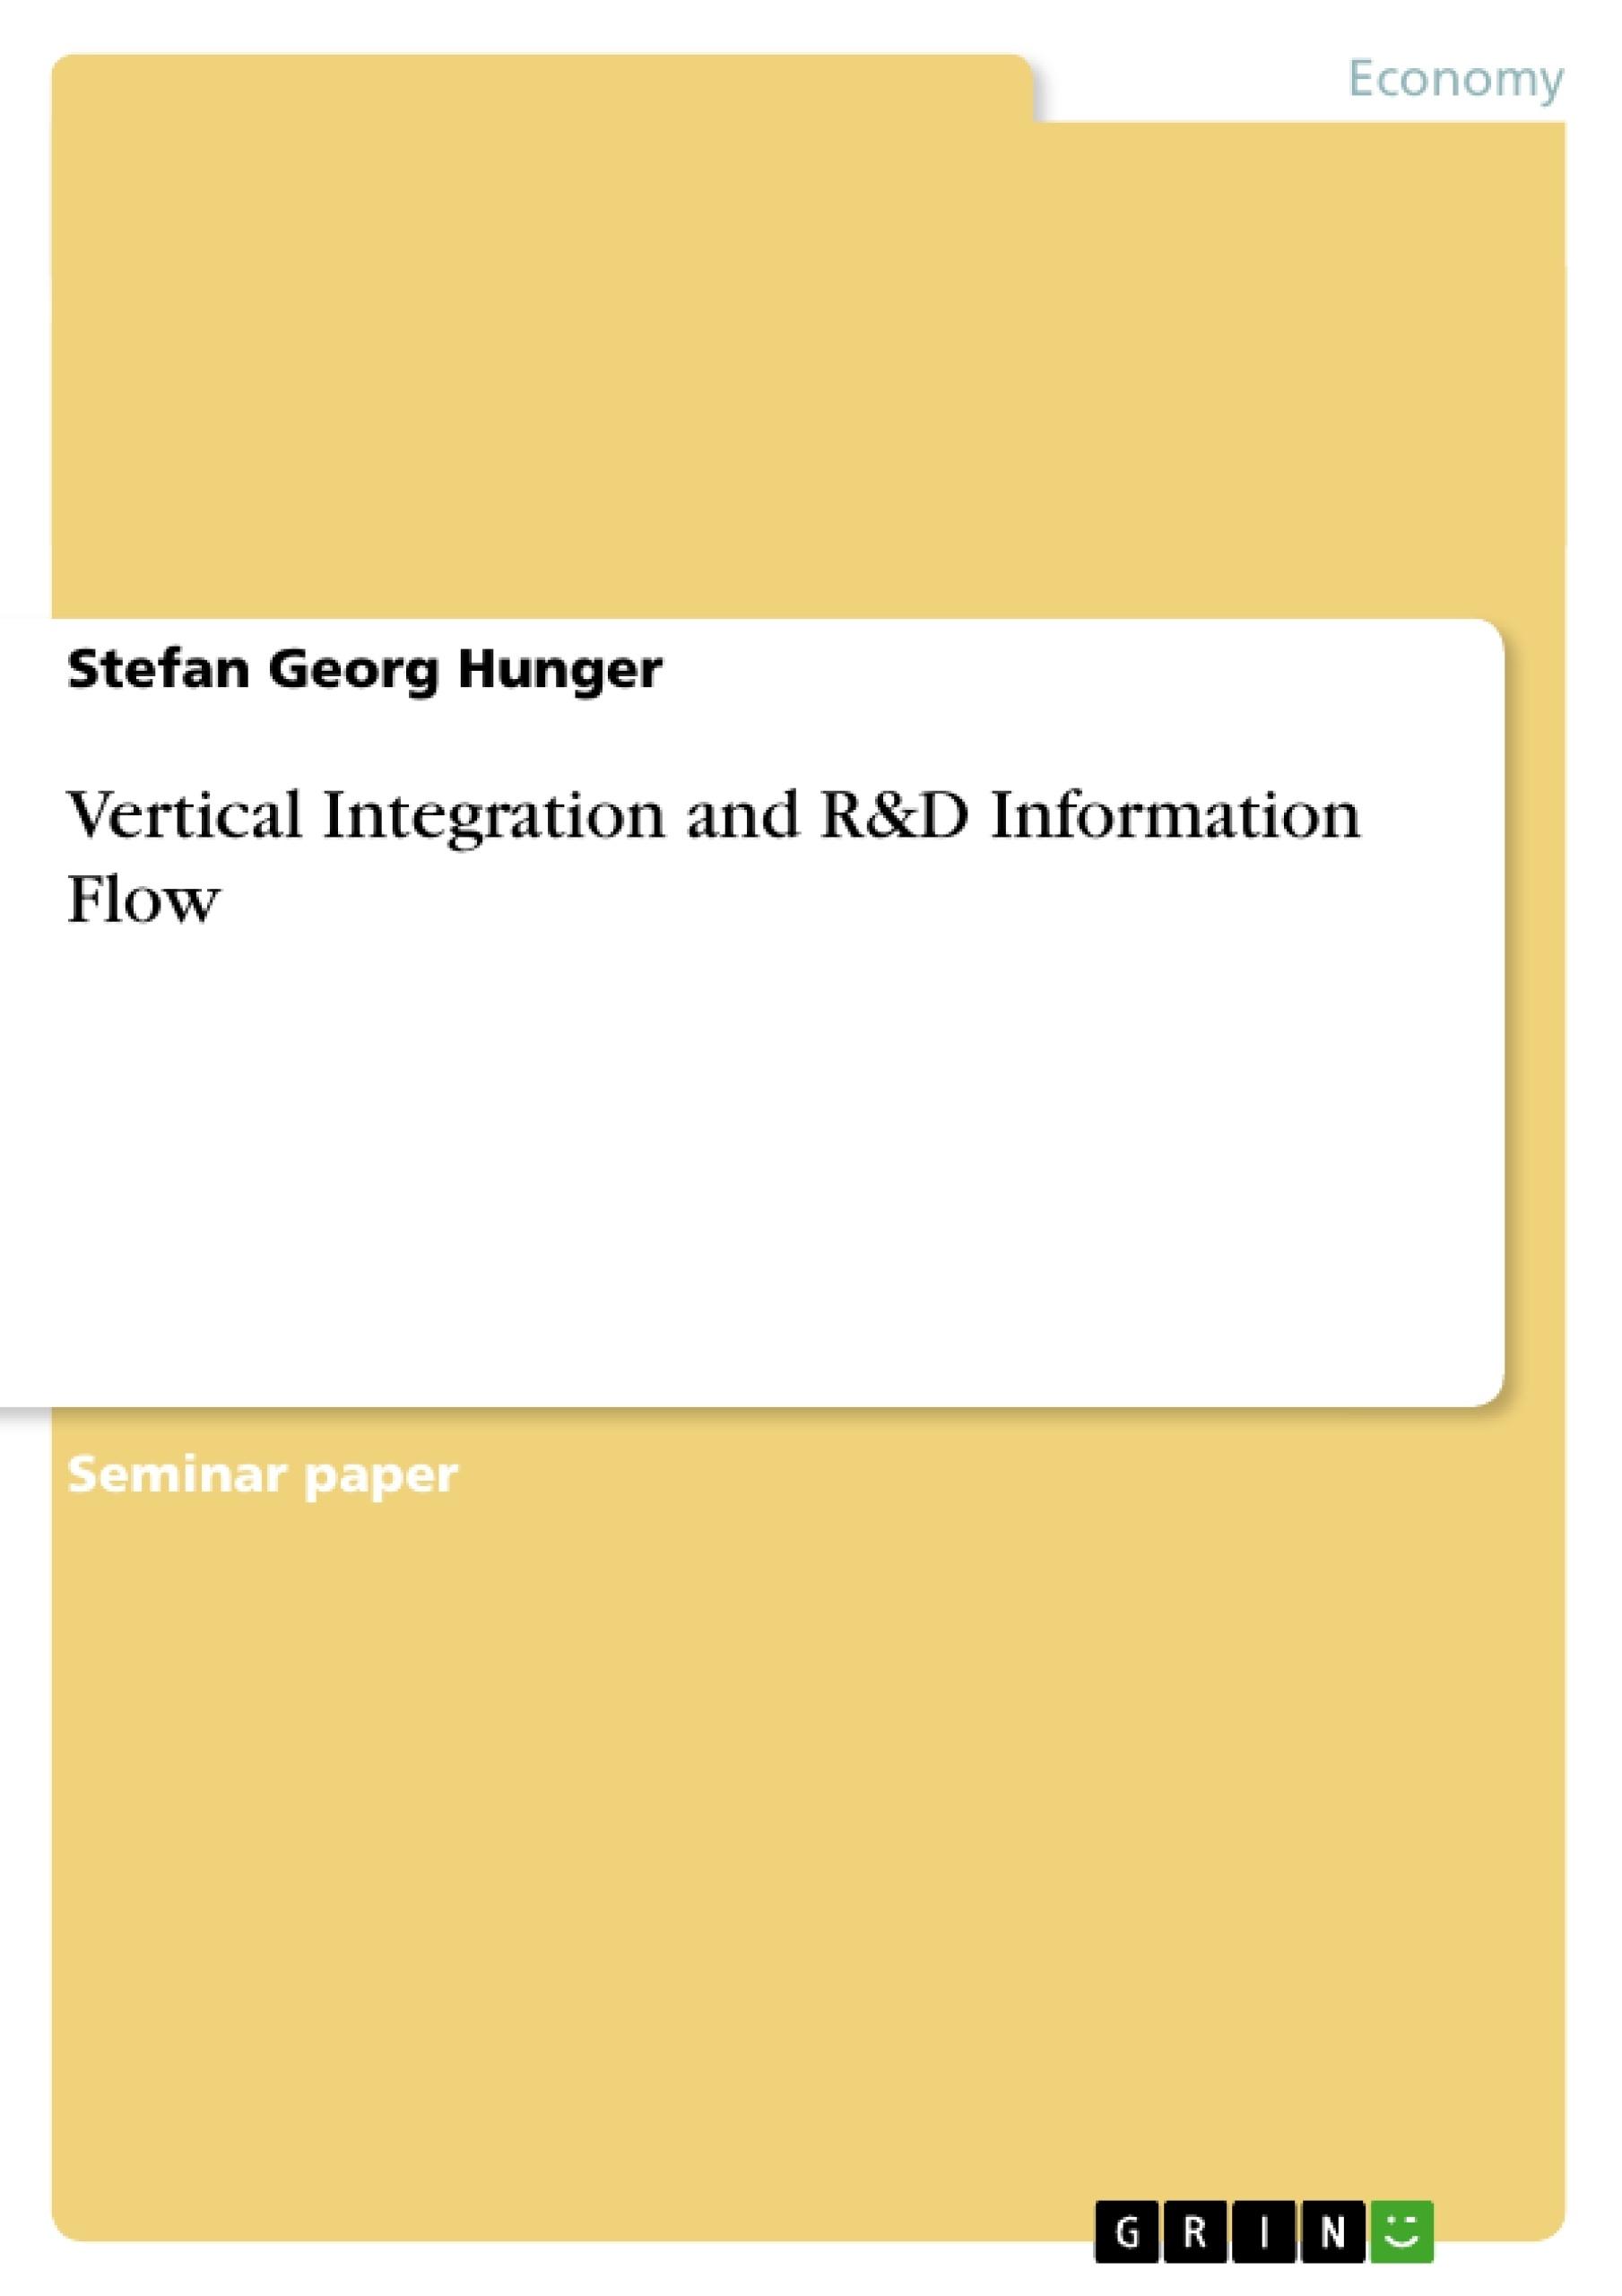 Title: Vertical Integration and R&D Information Flow